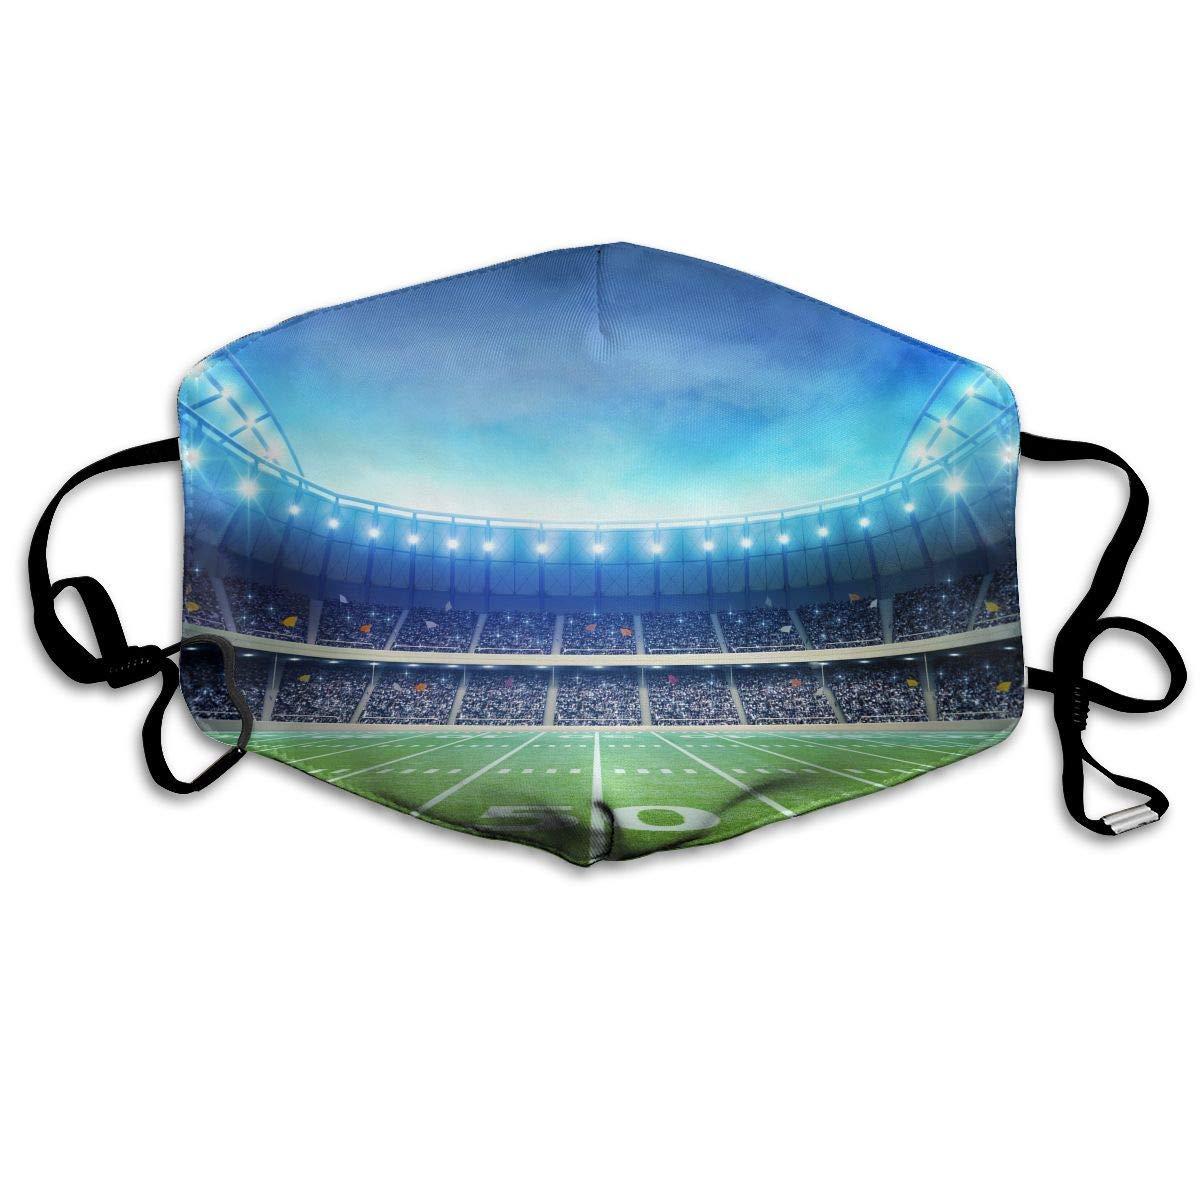 Daawqee Máscara de Boca, American Football Field Unisex Creative Mascarilla Washable Safety 100% Polyester Comfortable Breathable Health Half Face Masks